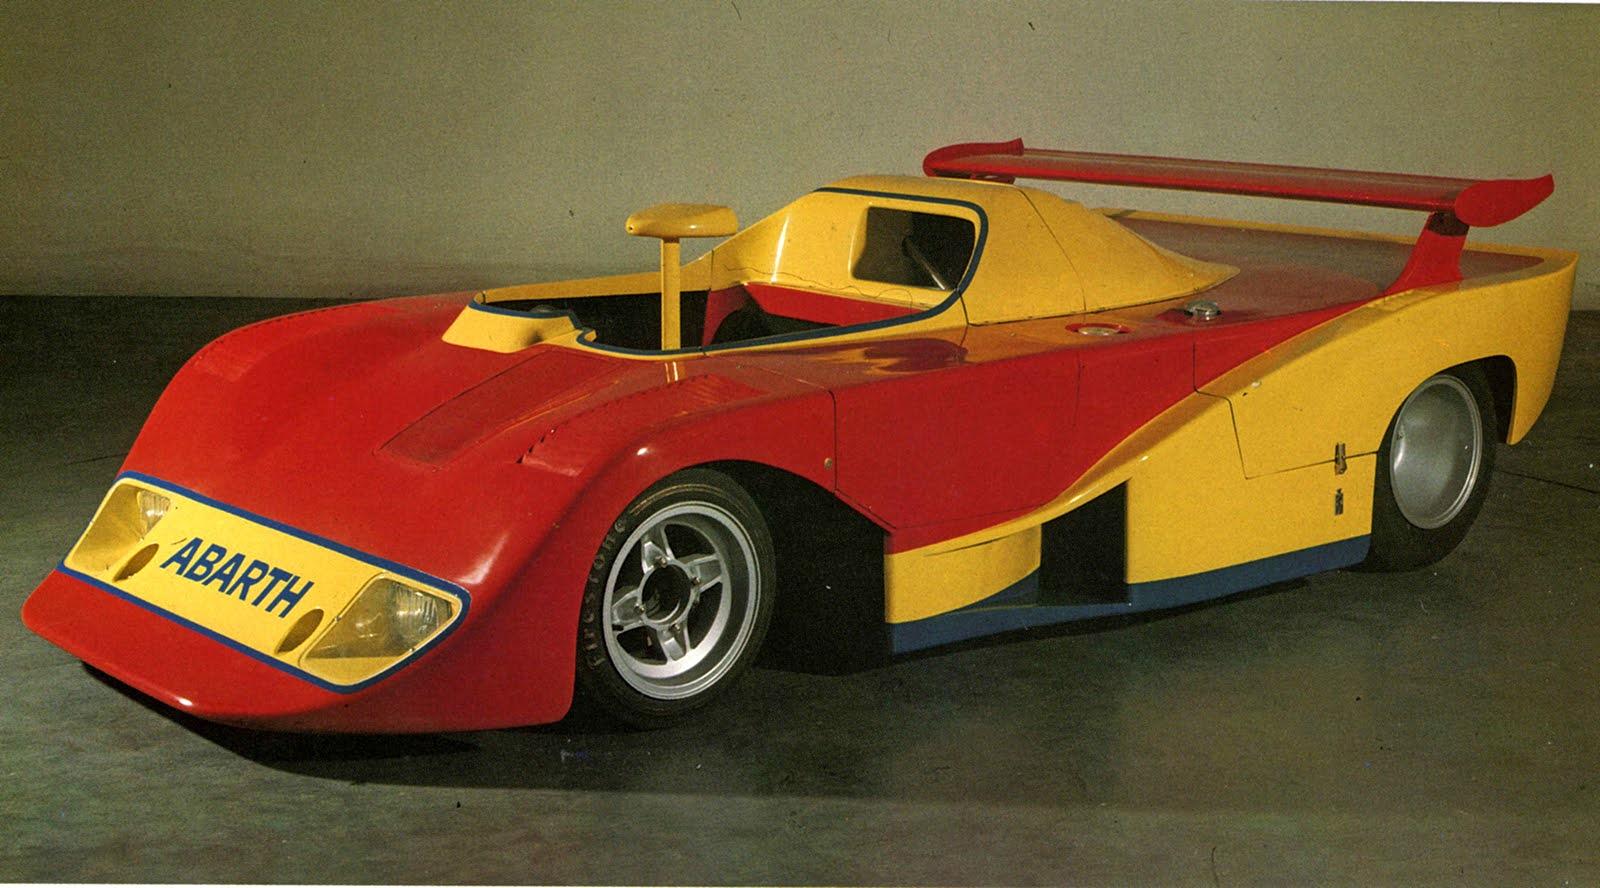 1974 ABARTH 2000 Prototipo Pininfarina SE027|アバルトの歴史を刻んだモデル No.055